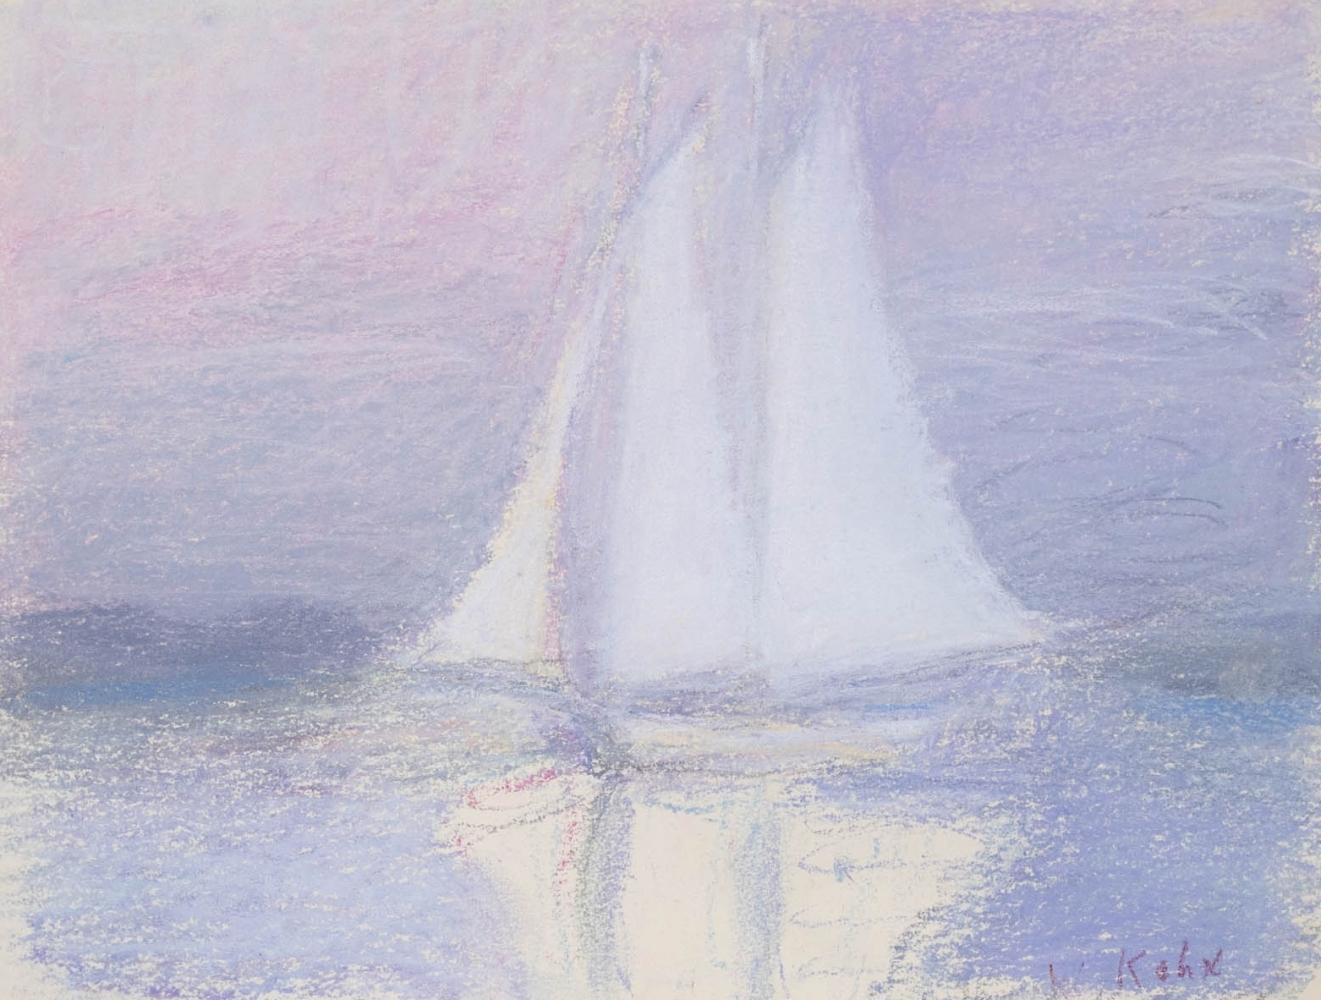 Wolf Kahn, Sailboat off of Martha's Vineyard, 1965, Pastel on paper, 9 x 12 inches, Wolf Kahn Pastels for sale, Wolf Kahn Pastels